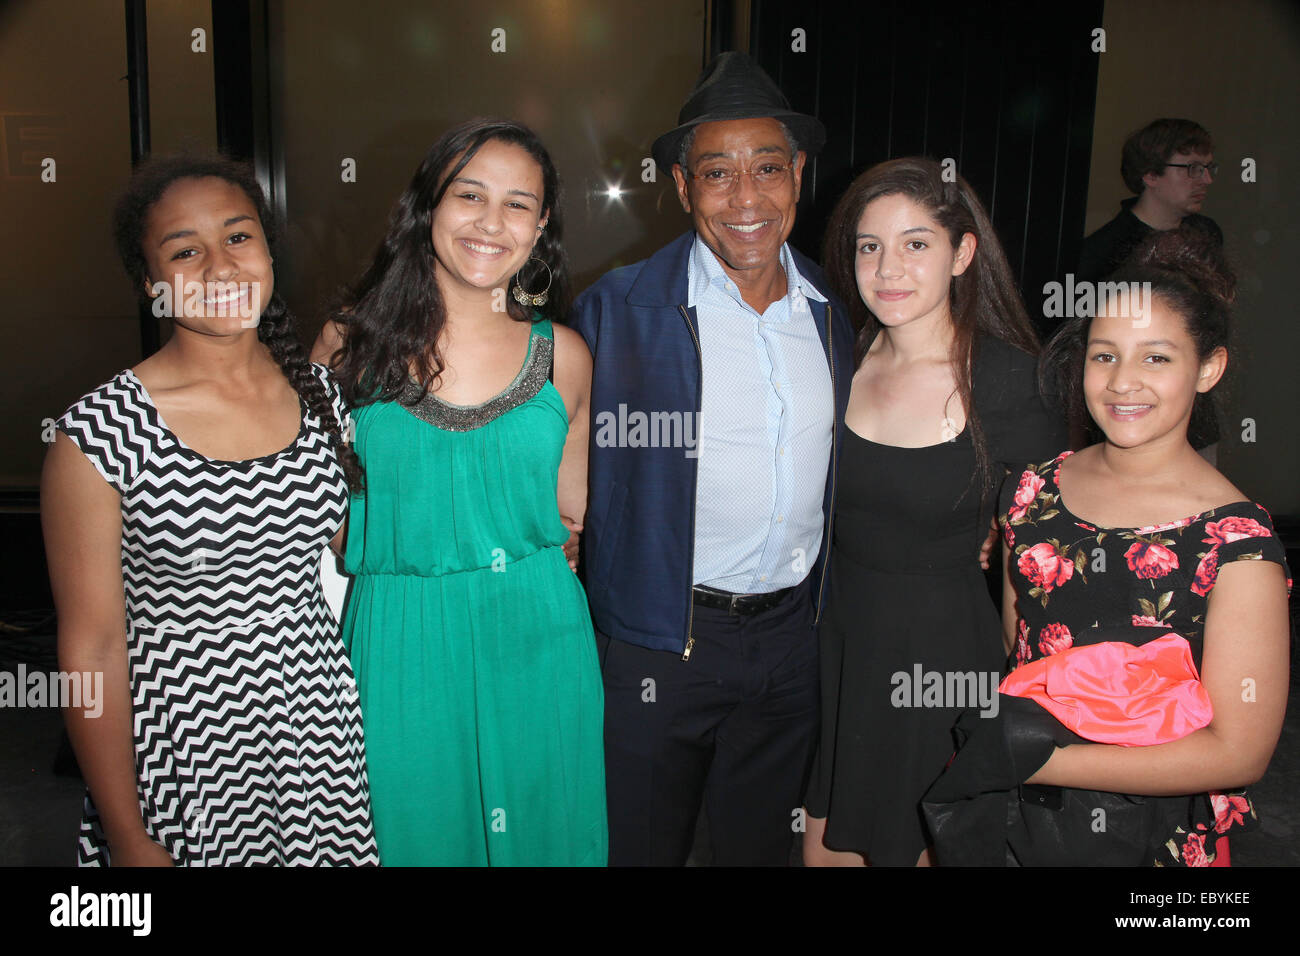 Giancarlo Esposito With Daughters Stockfotos Giancarlo Esposito